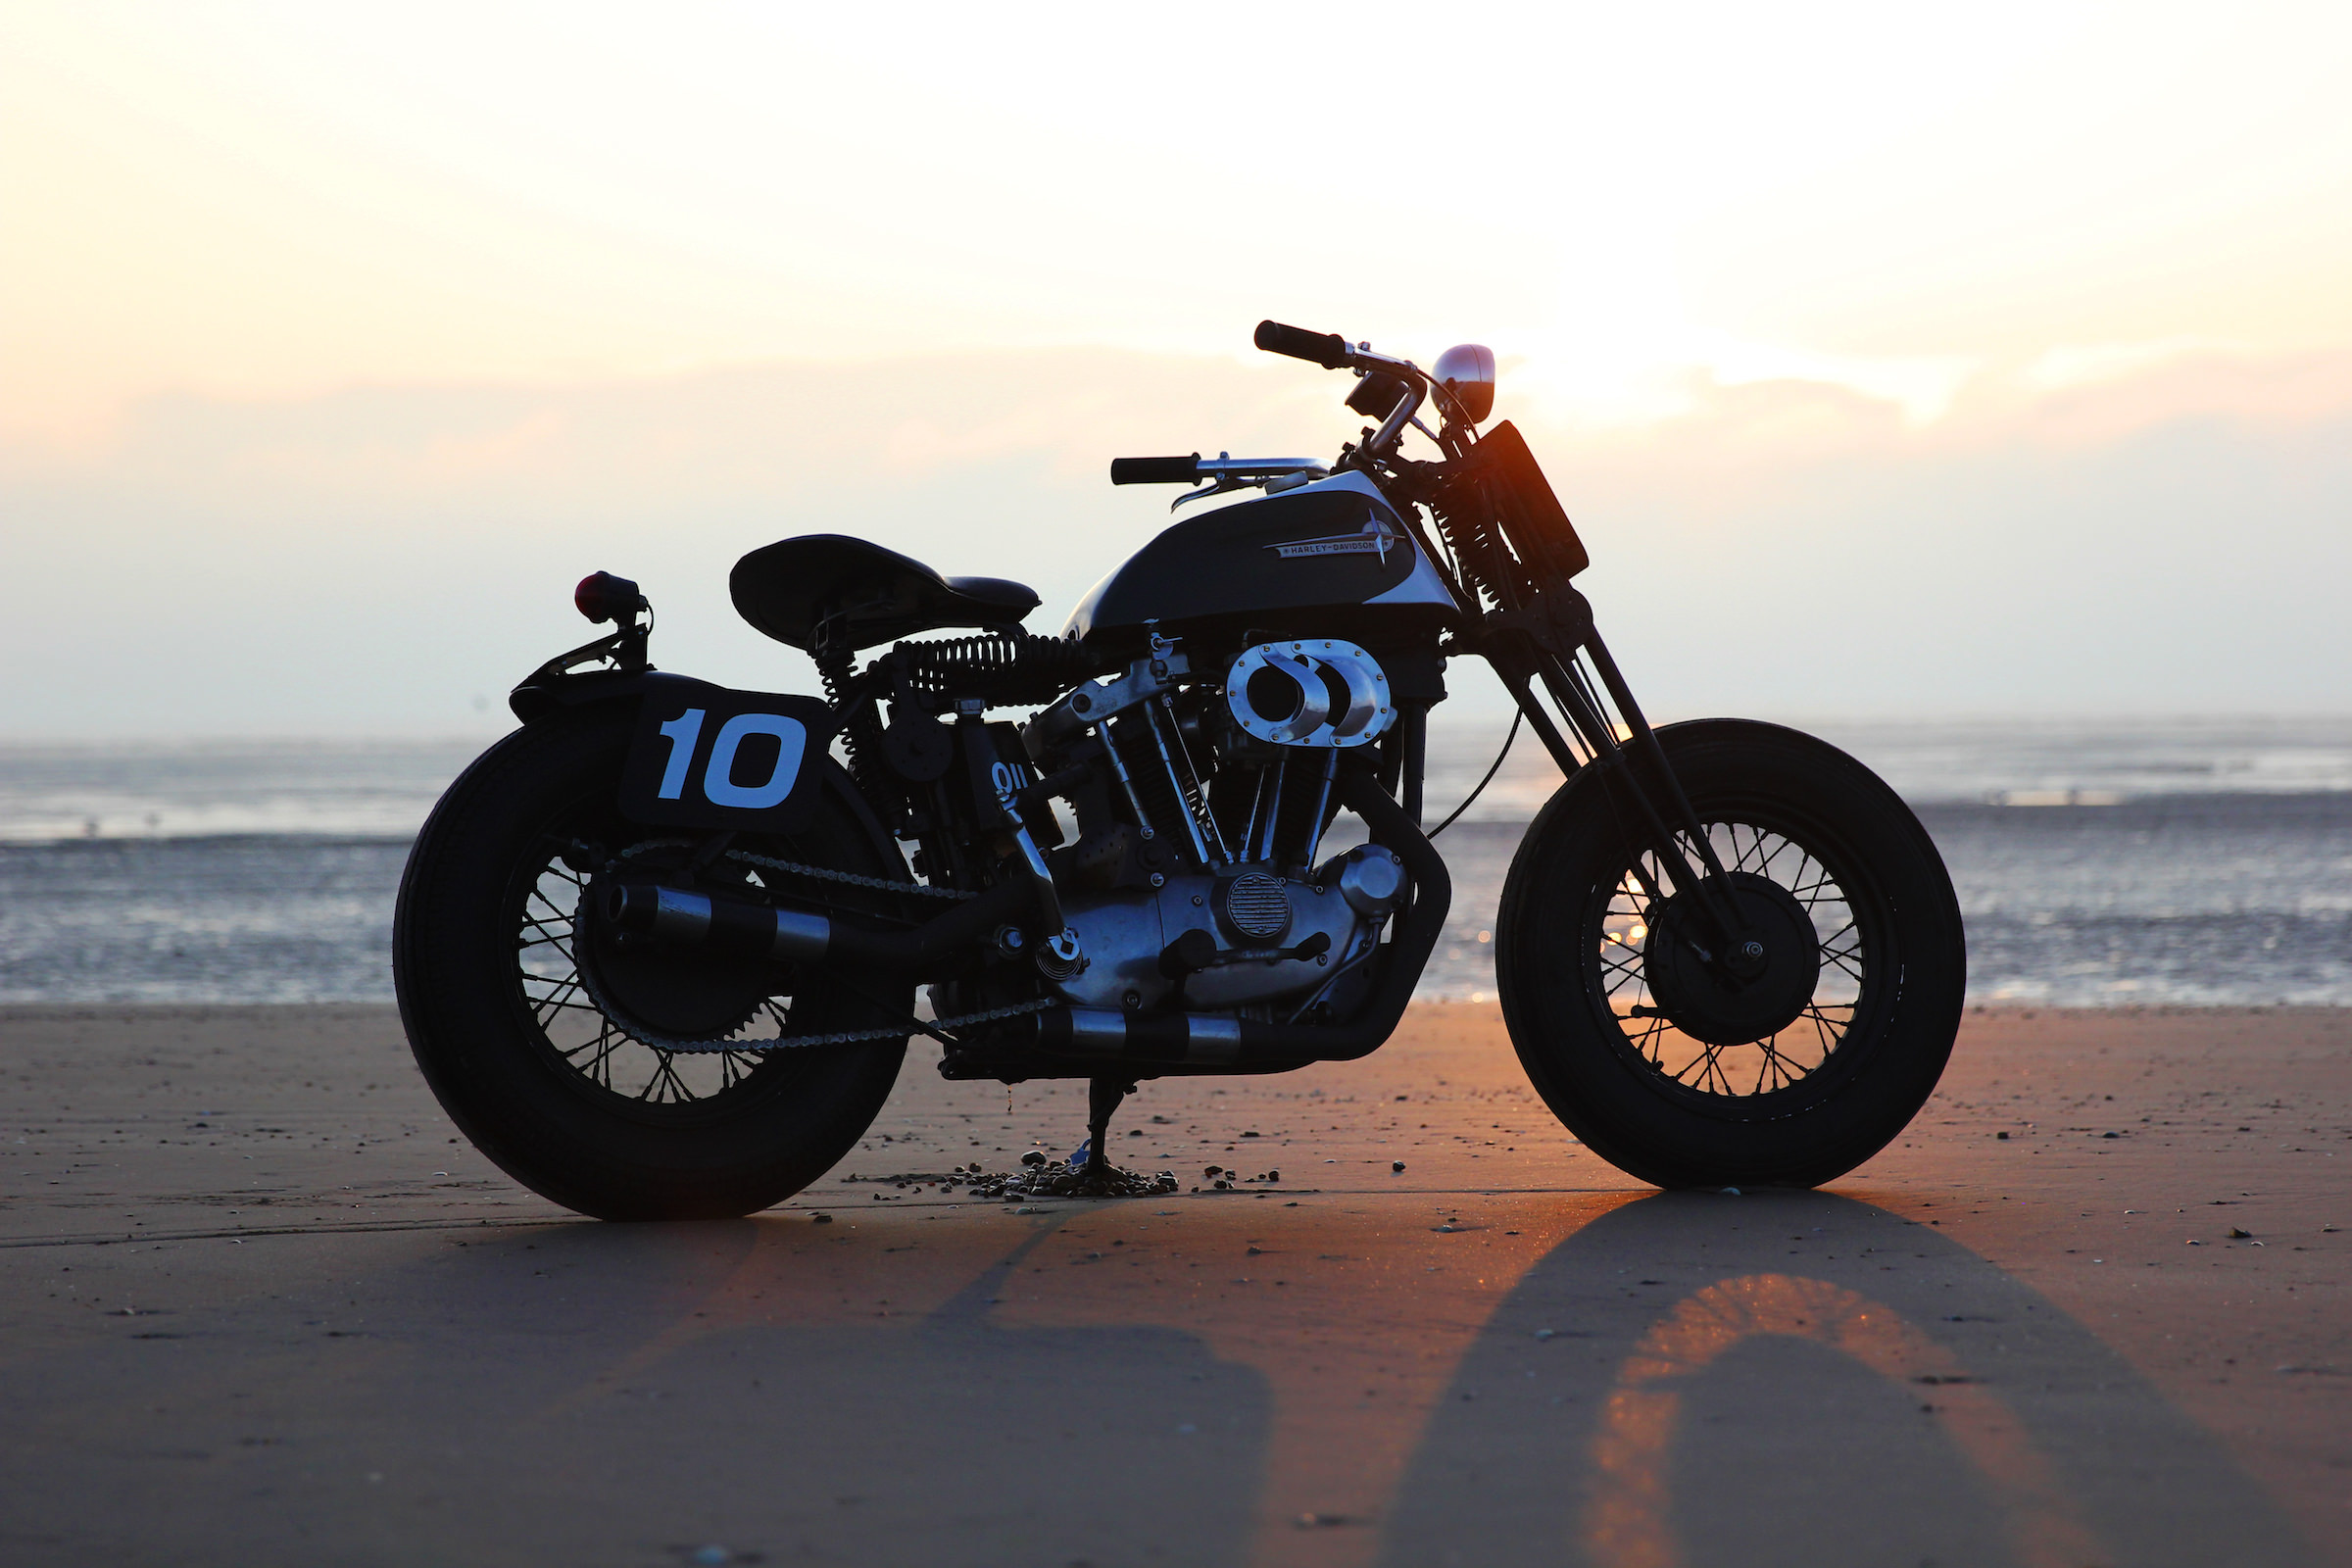 Harley Davidson Beach Racer